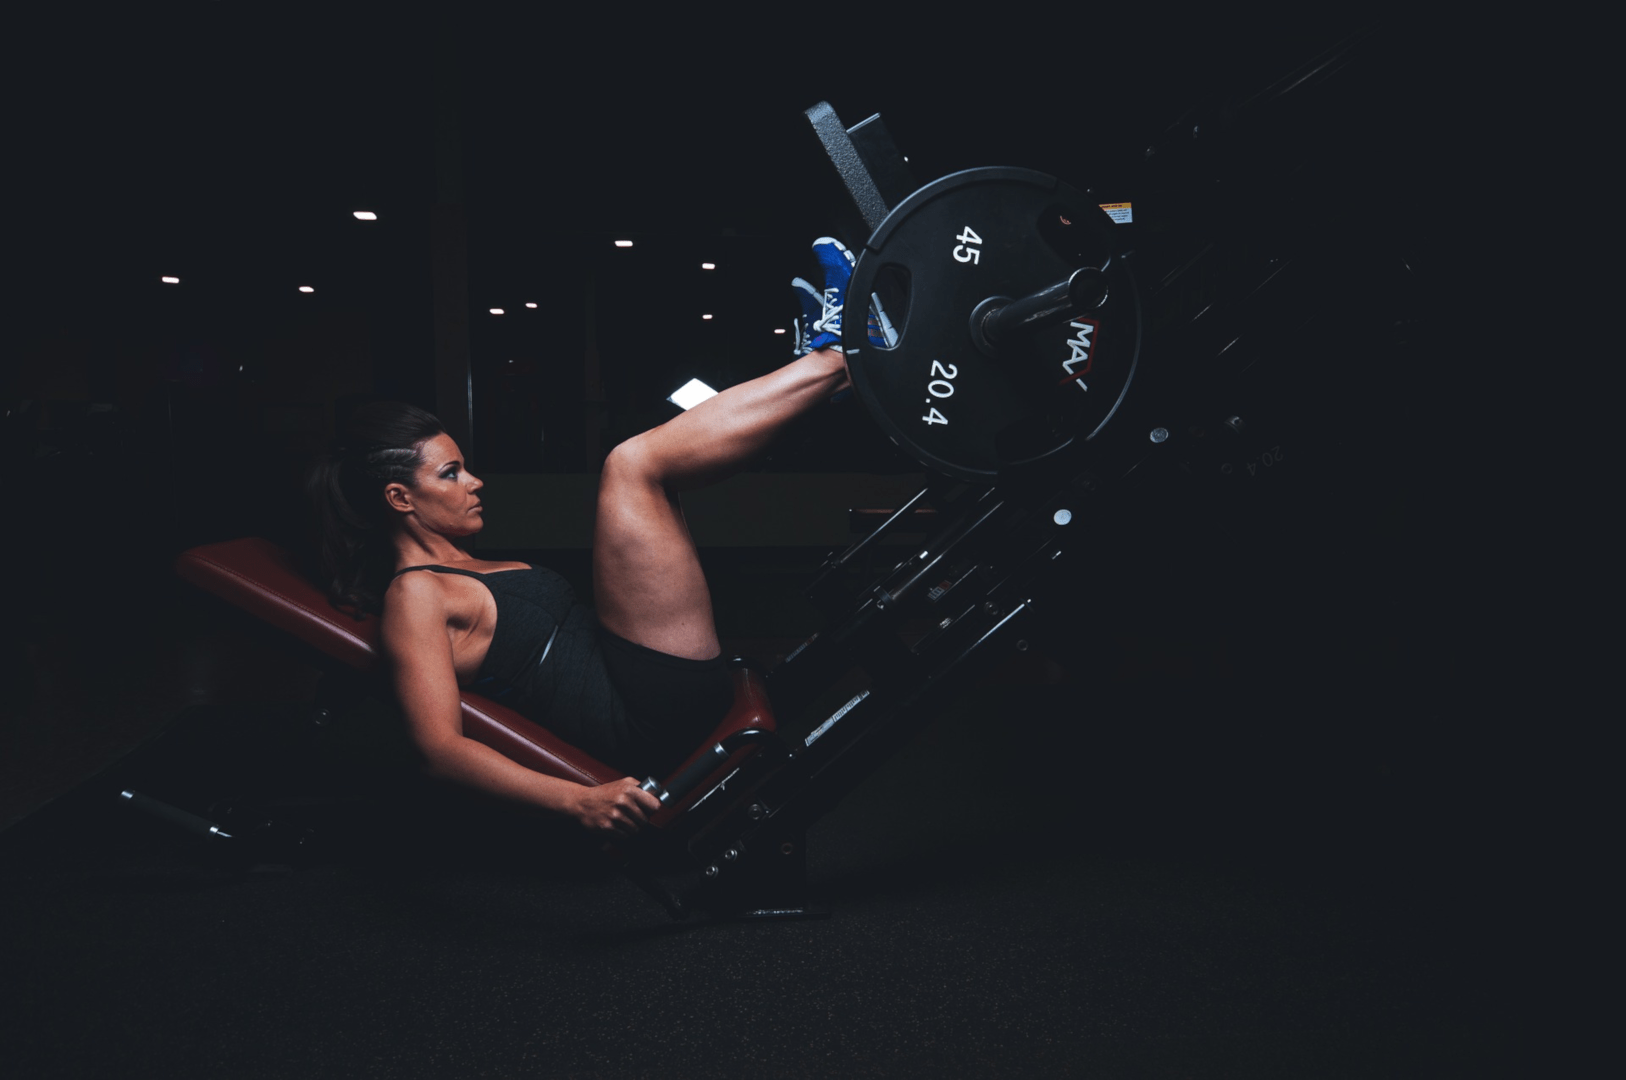 mulher fazendo exercicios para fortalecer as pernas